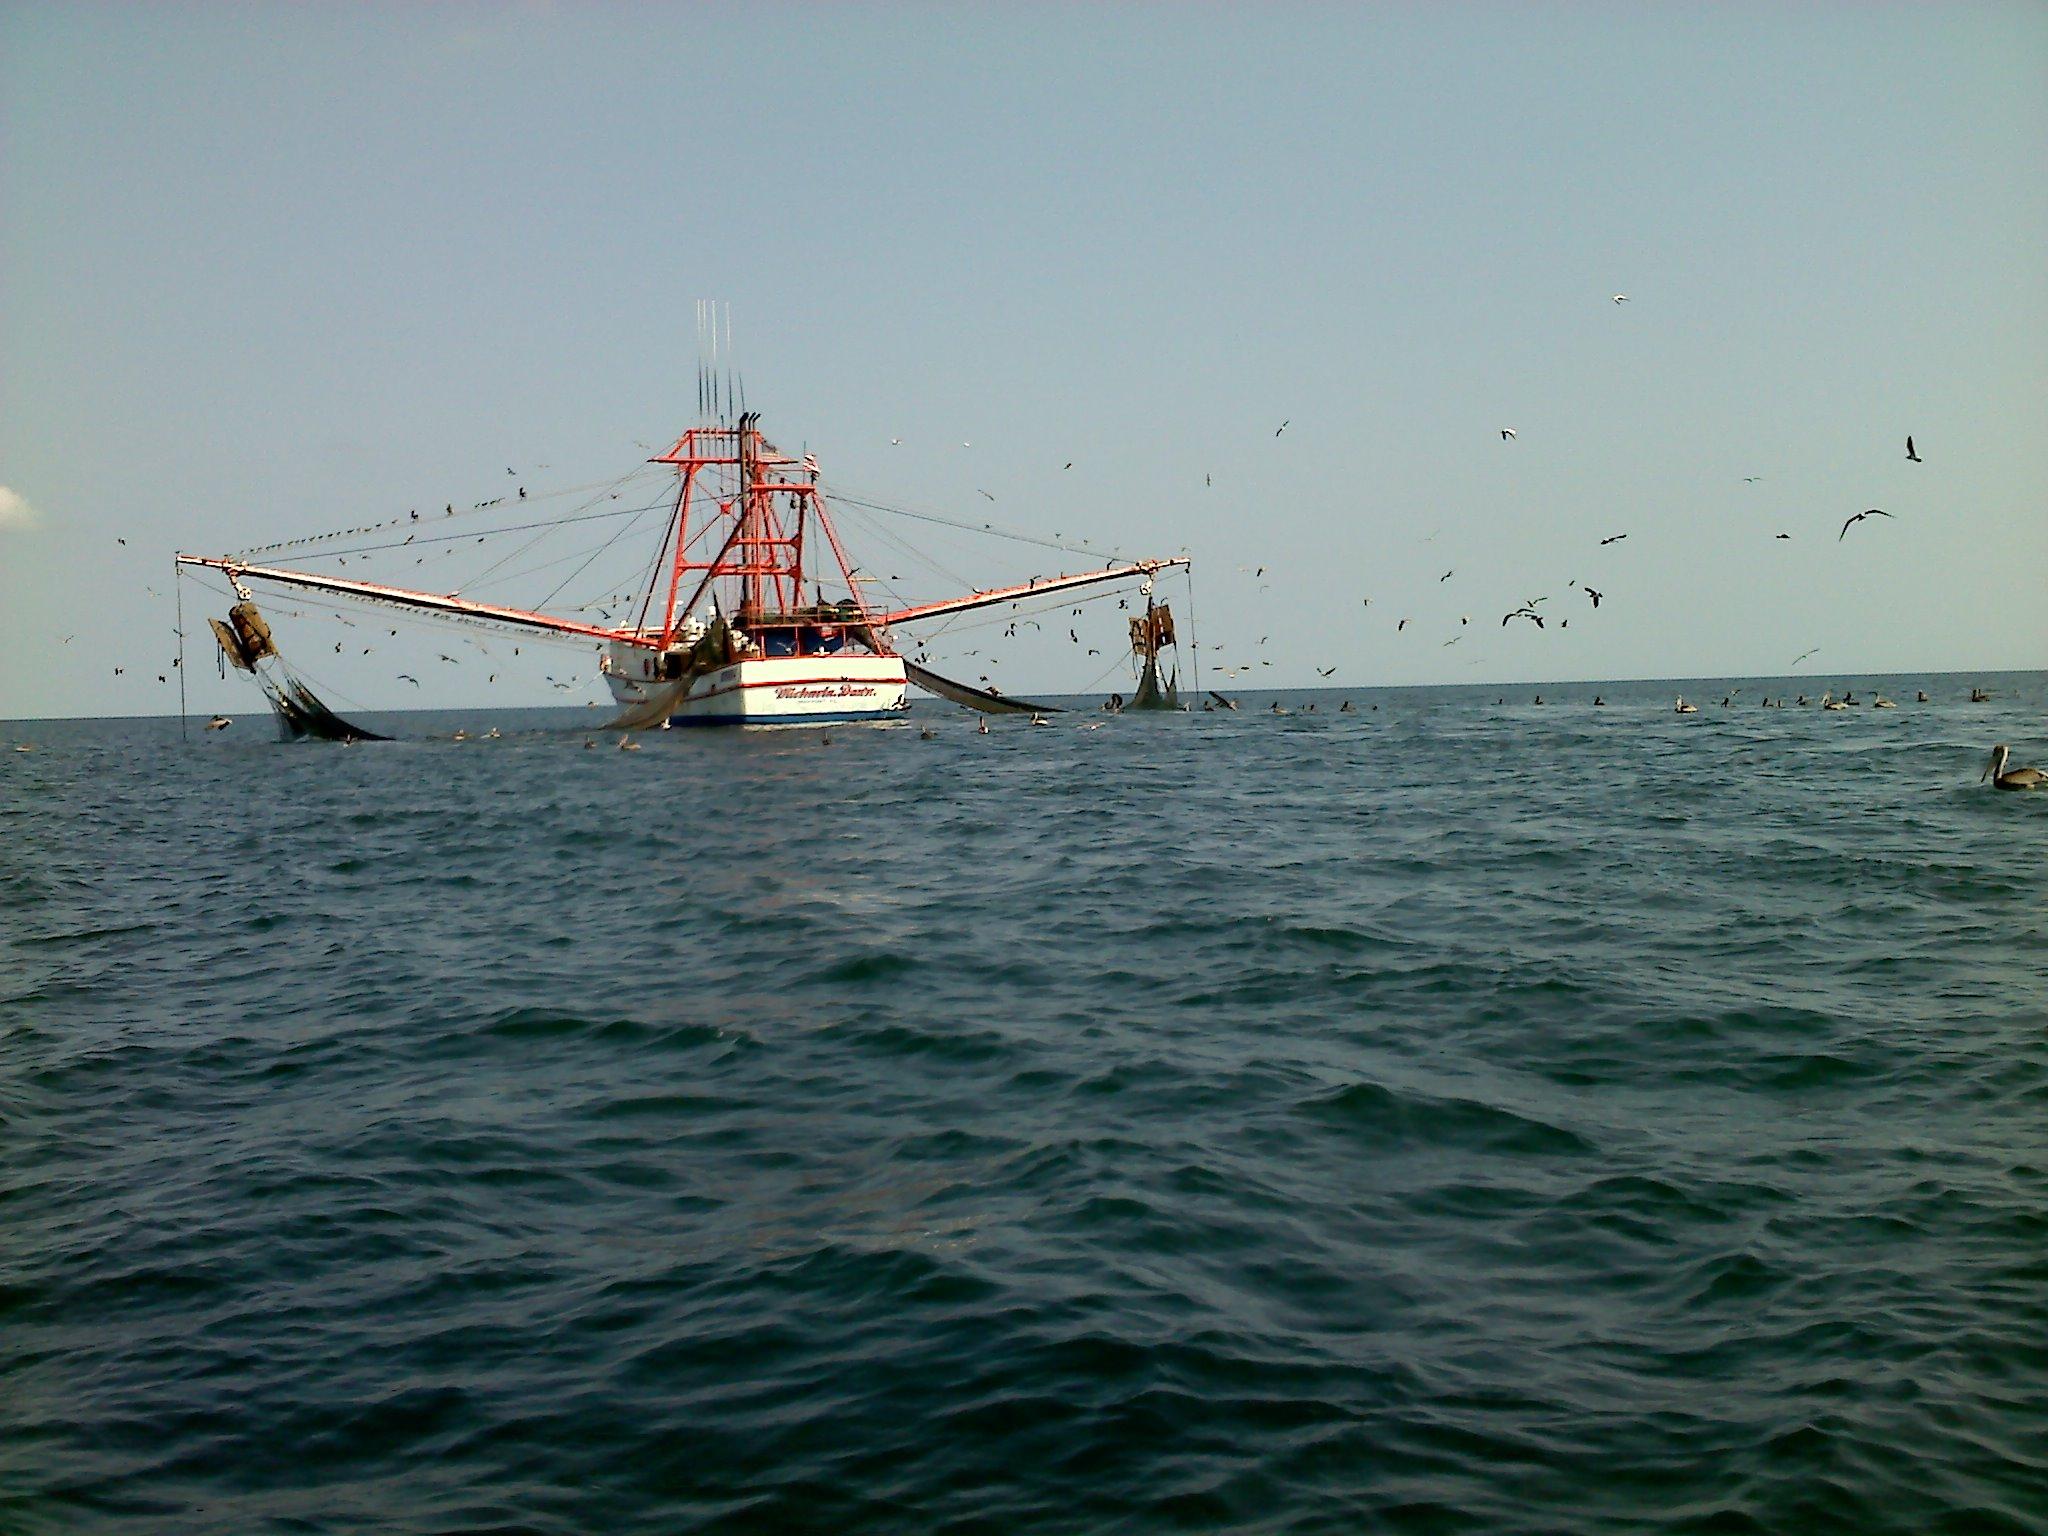 Img 0889 new smyrna beach charter fishing in shore for New smyrna fishing charters